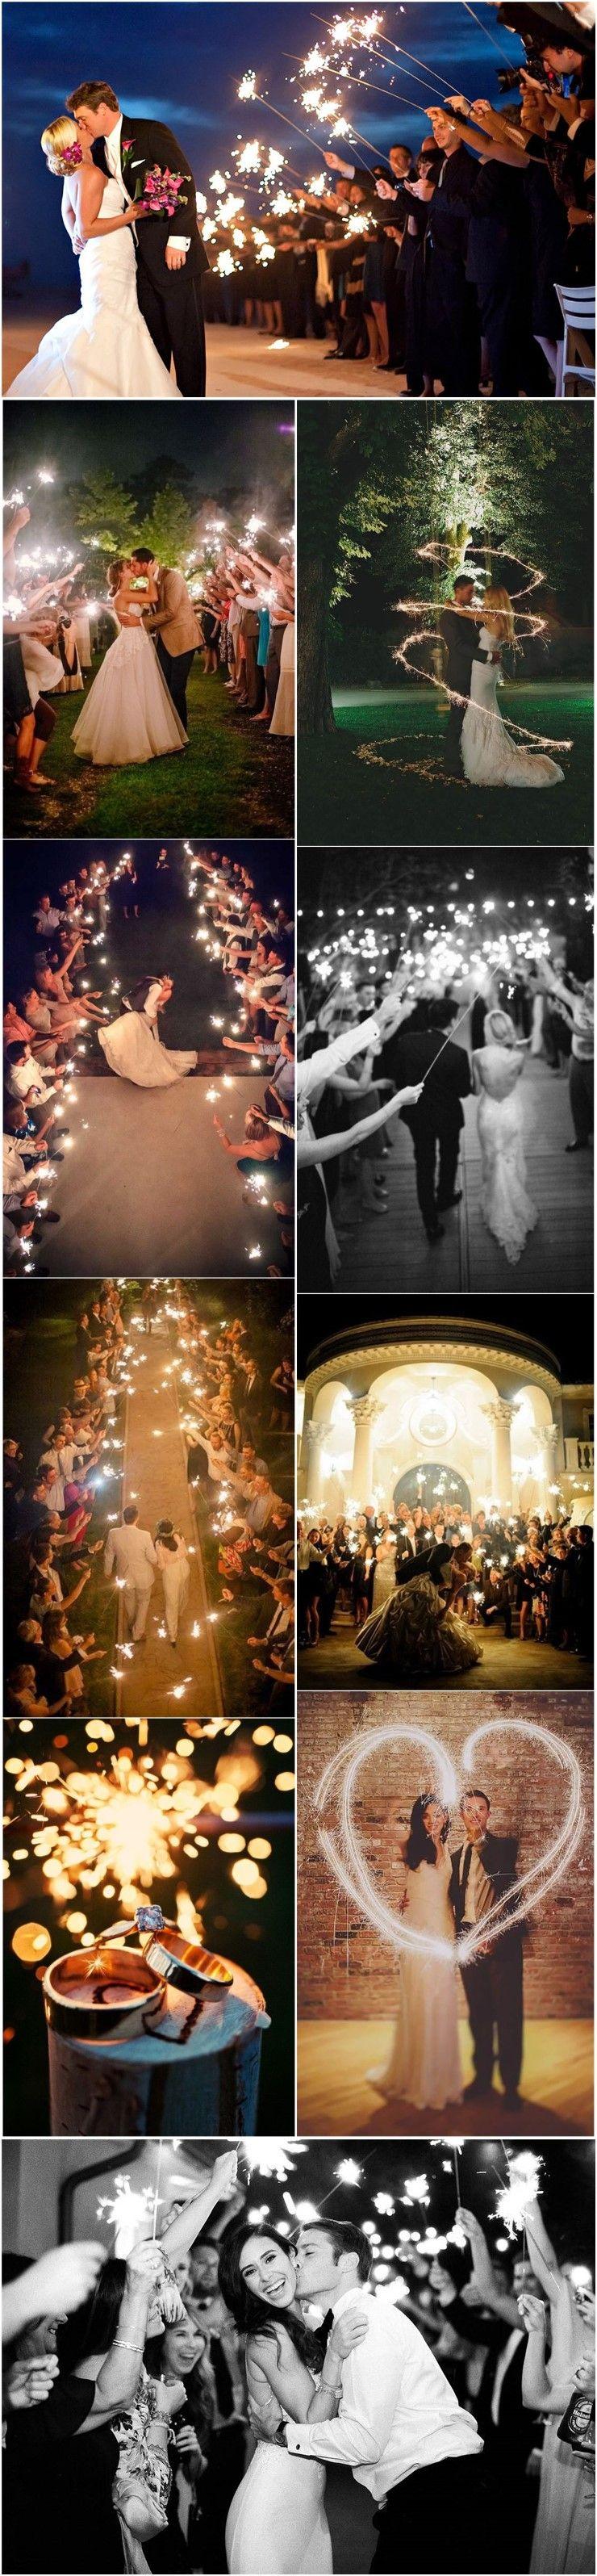 20 Magical Wedding Sparkler Send Off Ideas For Your Wedding Wedding Sparklers Sparkler Exit Wedding Magical Wedding